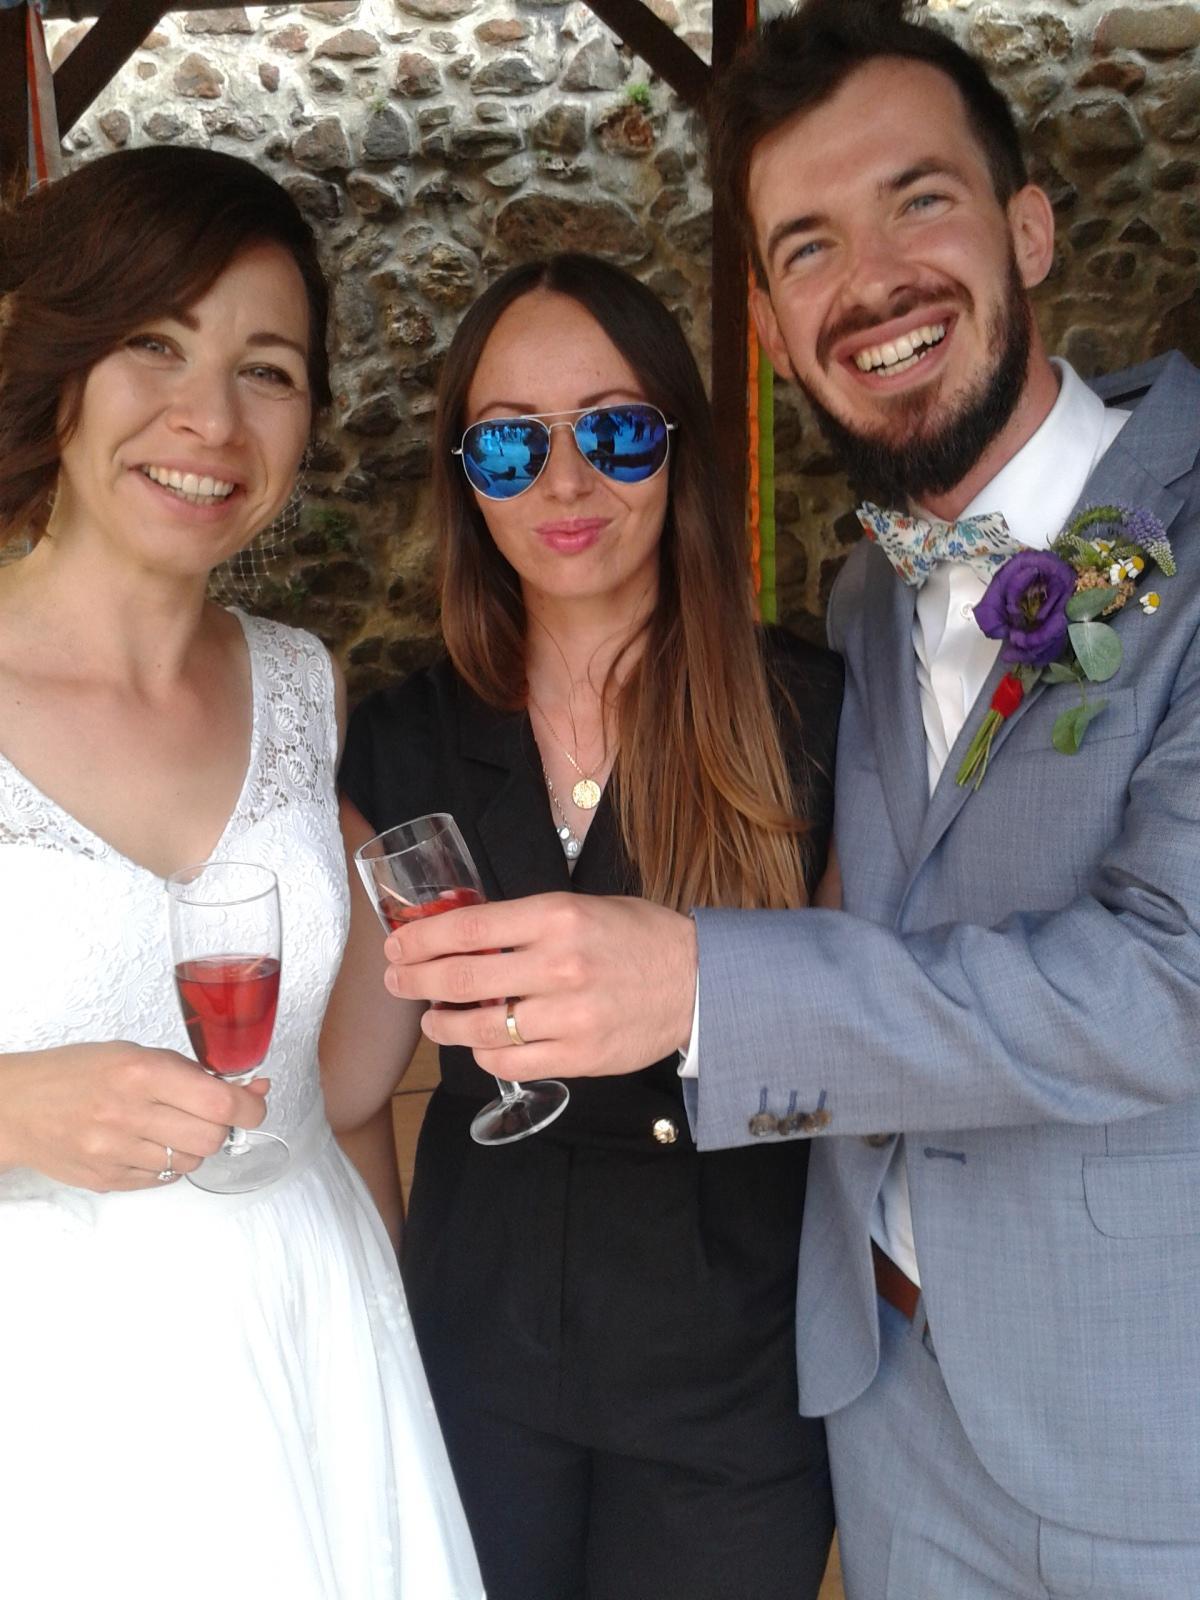 Svadba pod holým nebom - Kremnica - dj eLLy d - svadba Kremnica - dj eLLy d